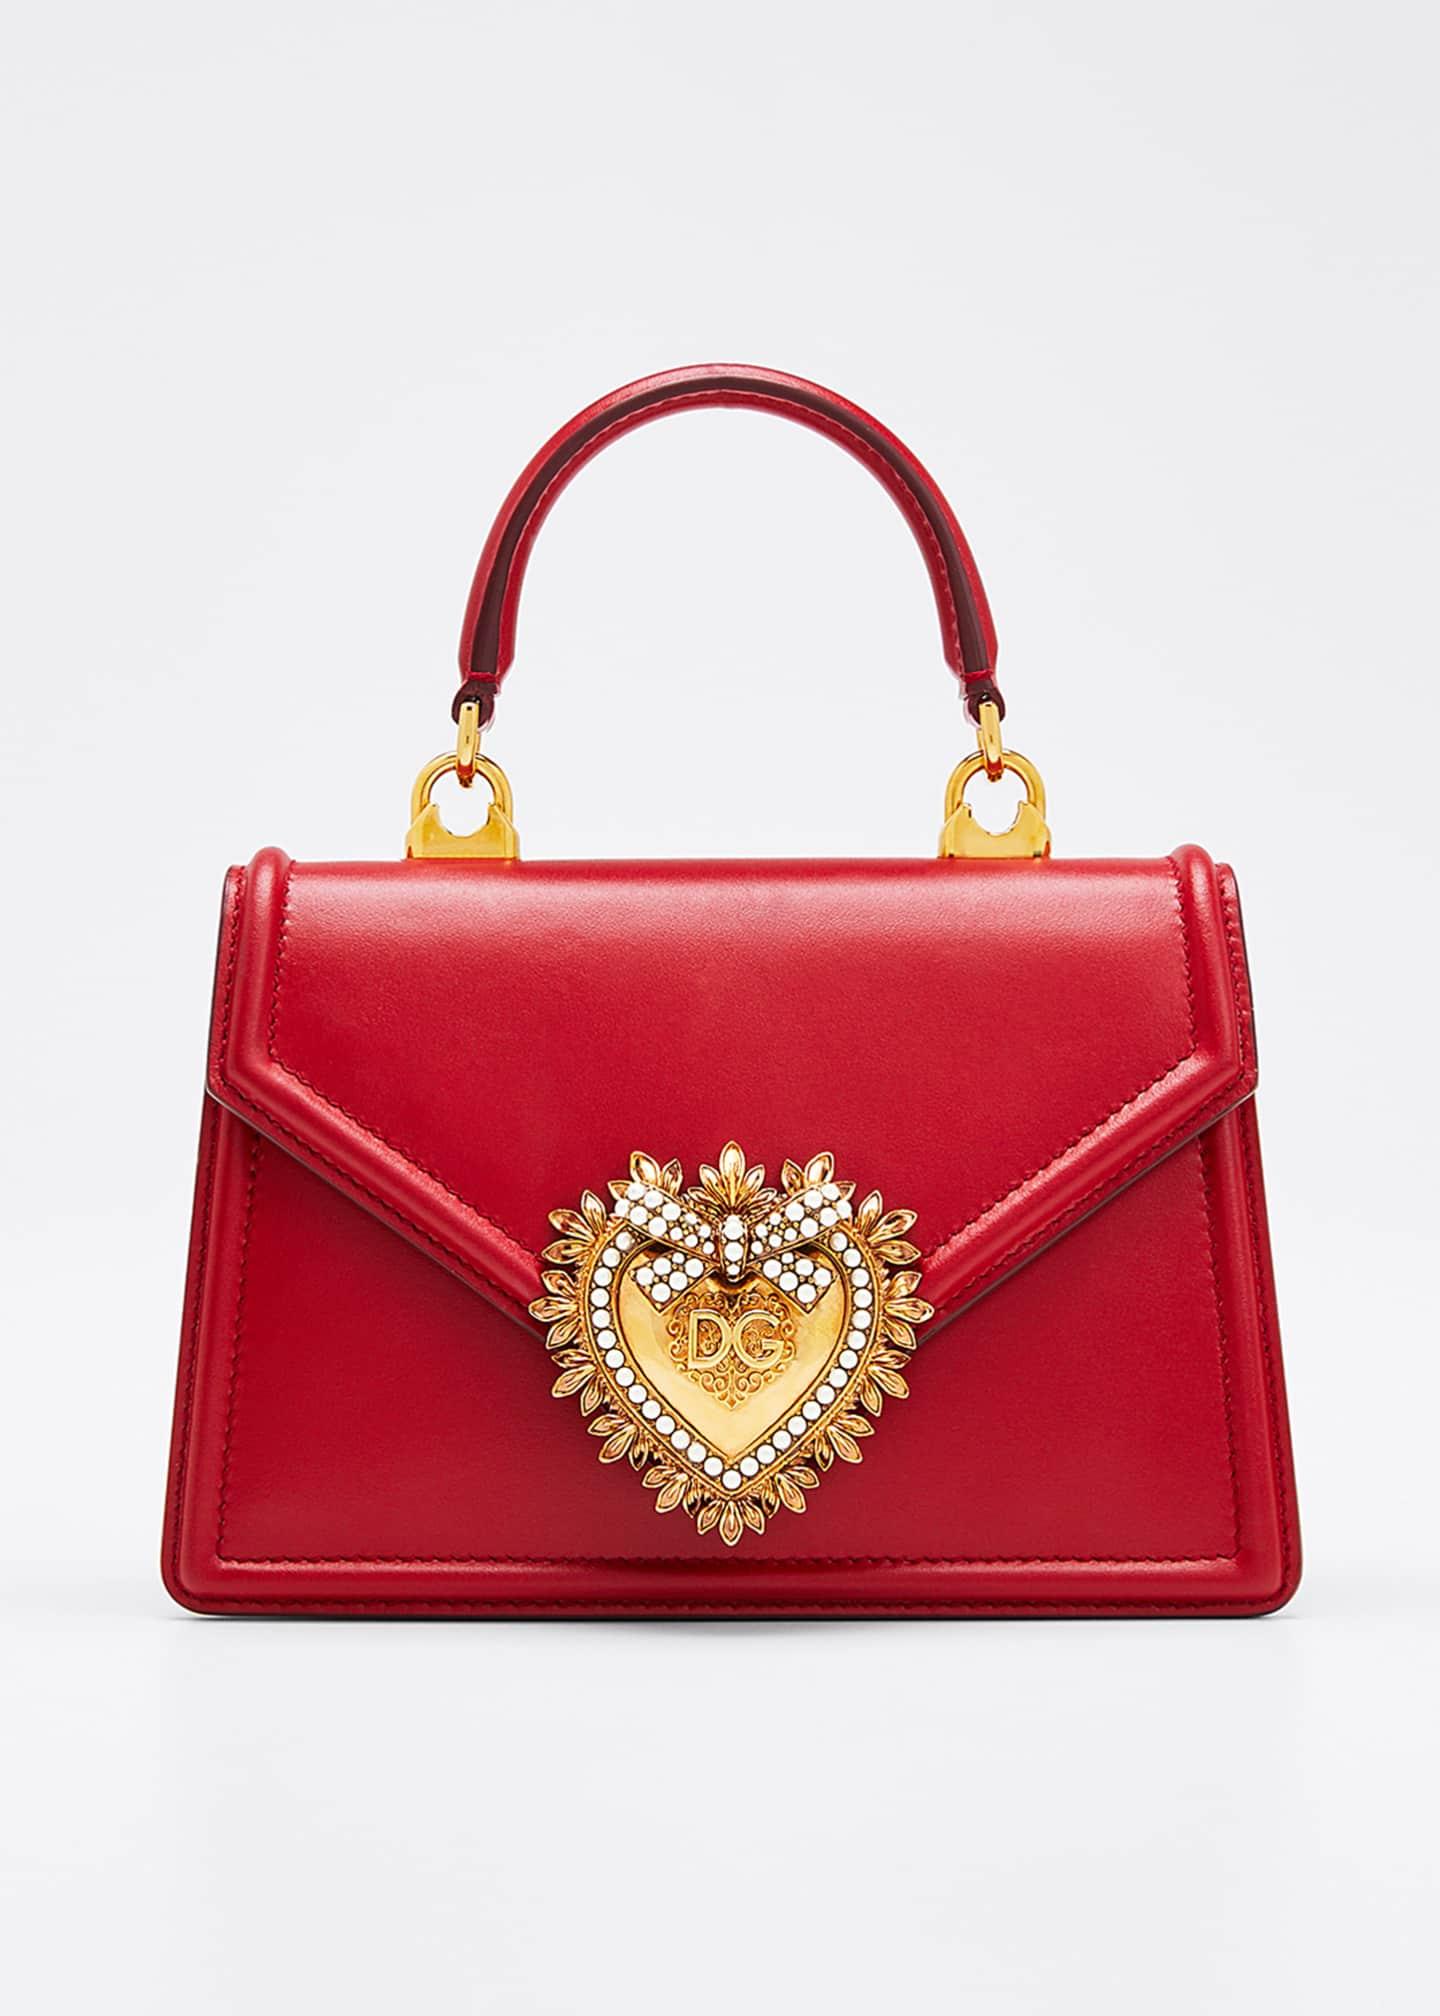 Dolce & Gabbana Devotion Mini Leather Top-Handle Bag